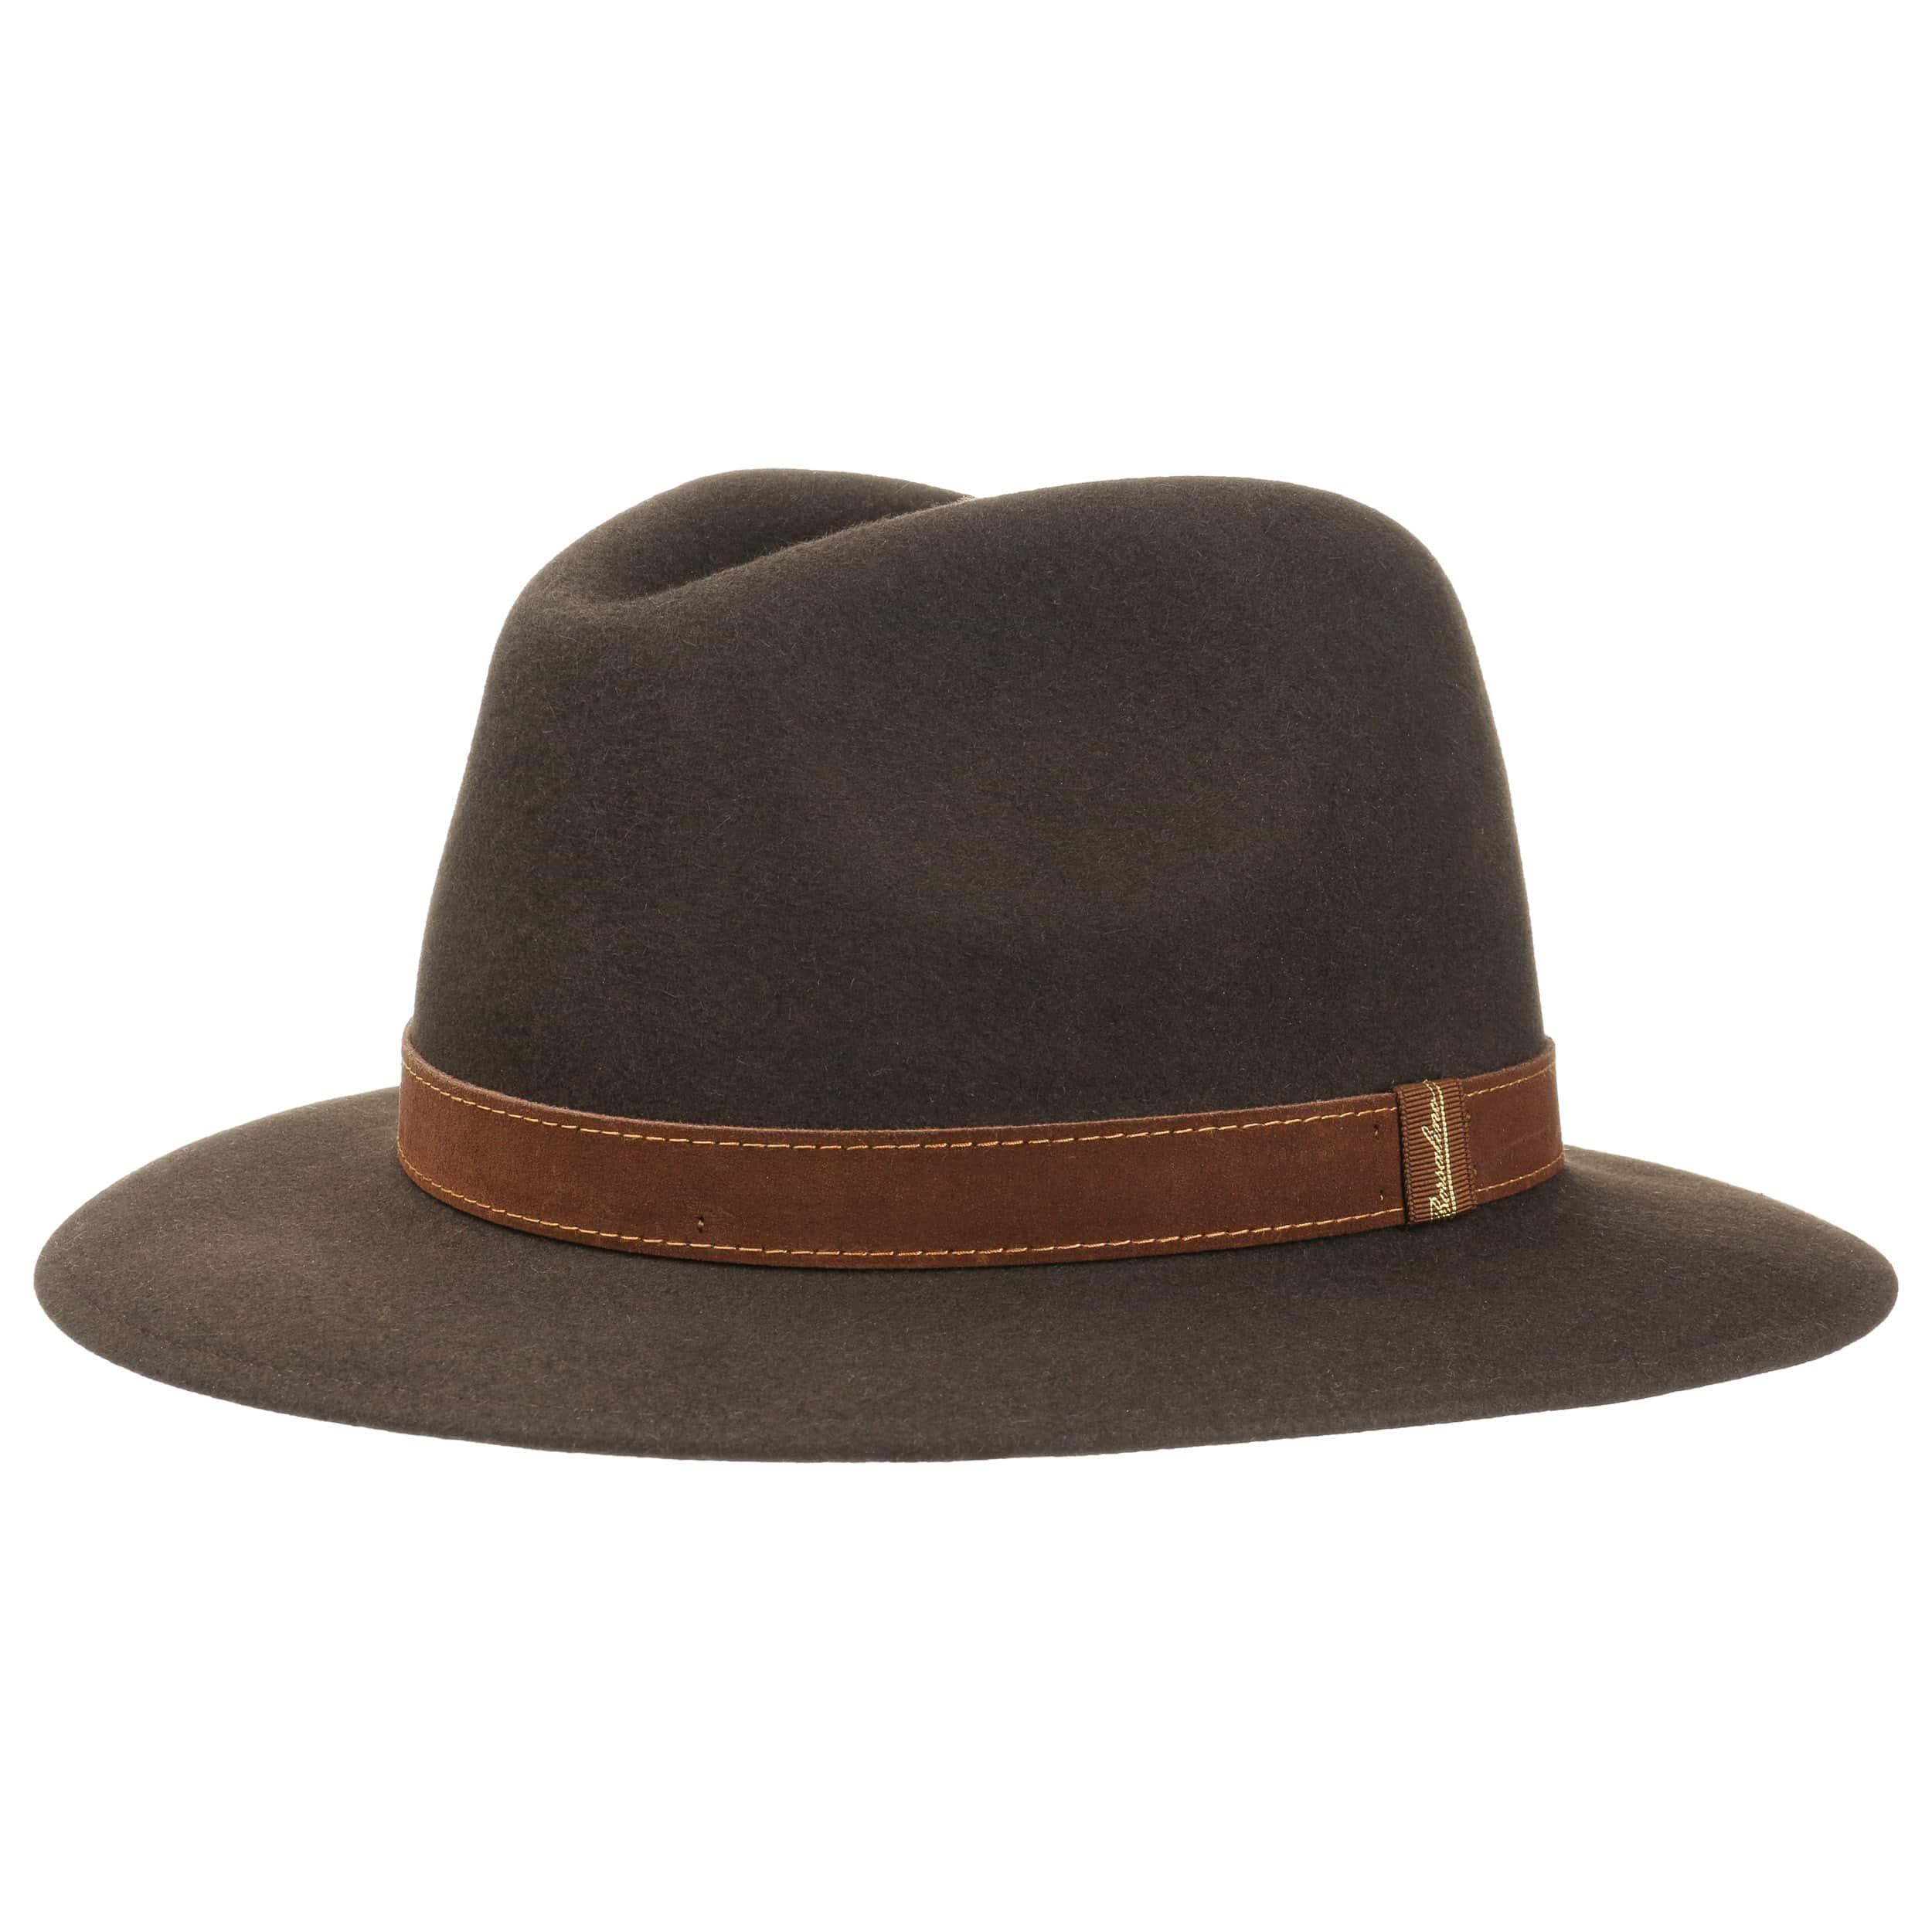 Borsalino Traveller Hats